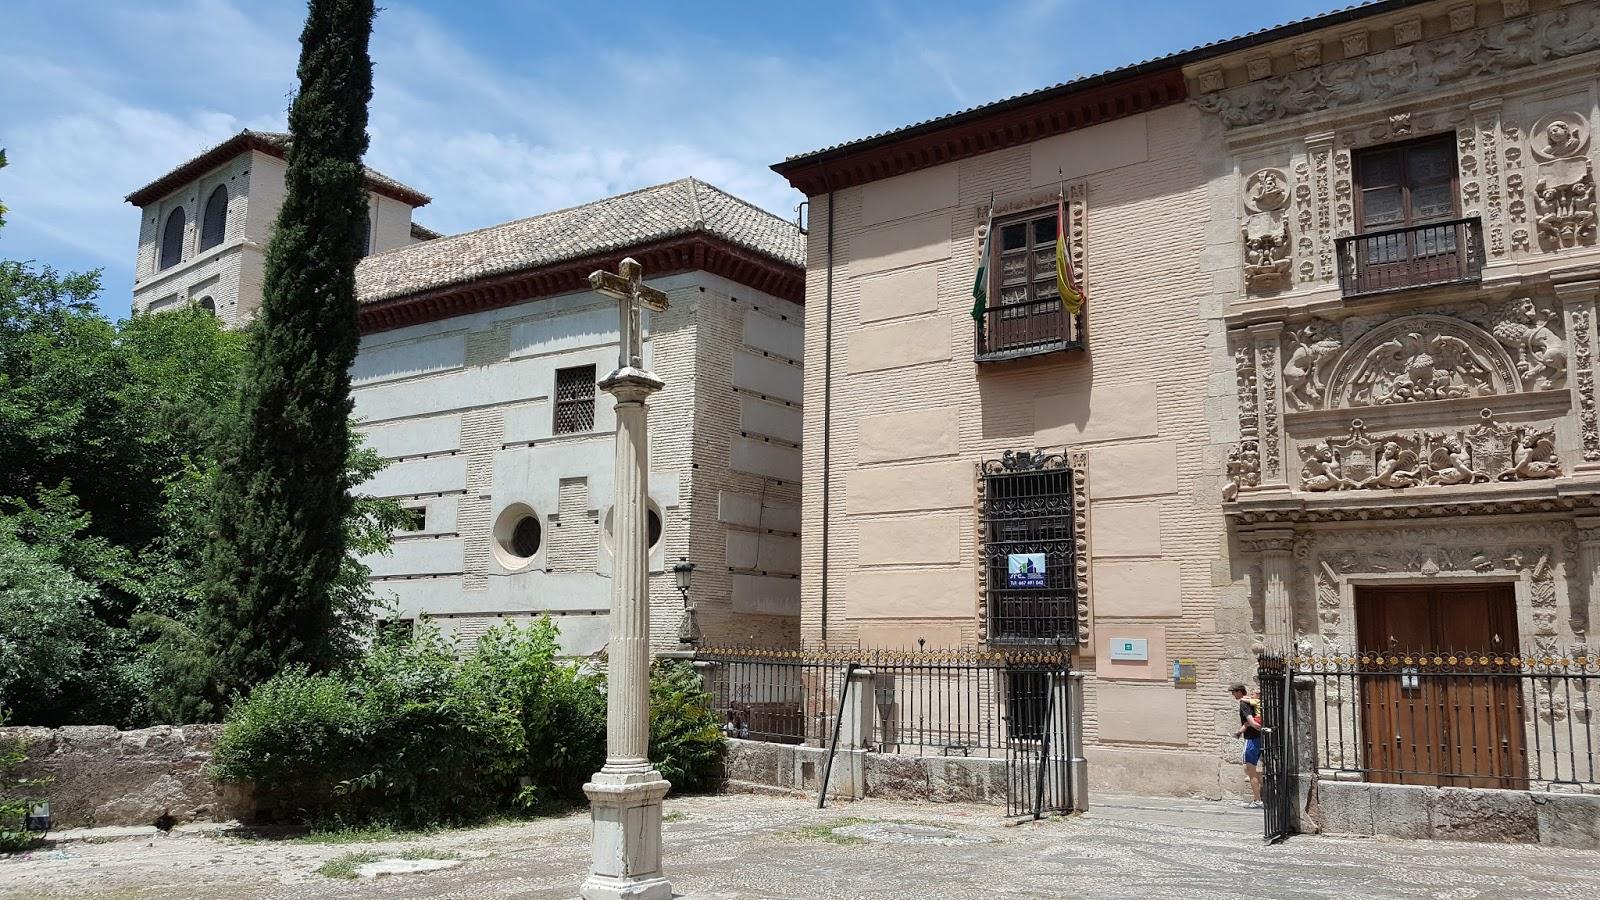 Casa de castril granada identidad e imagen de andaluc a for Casas modernas granada